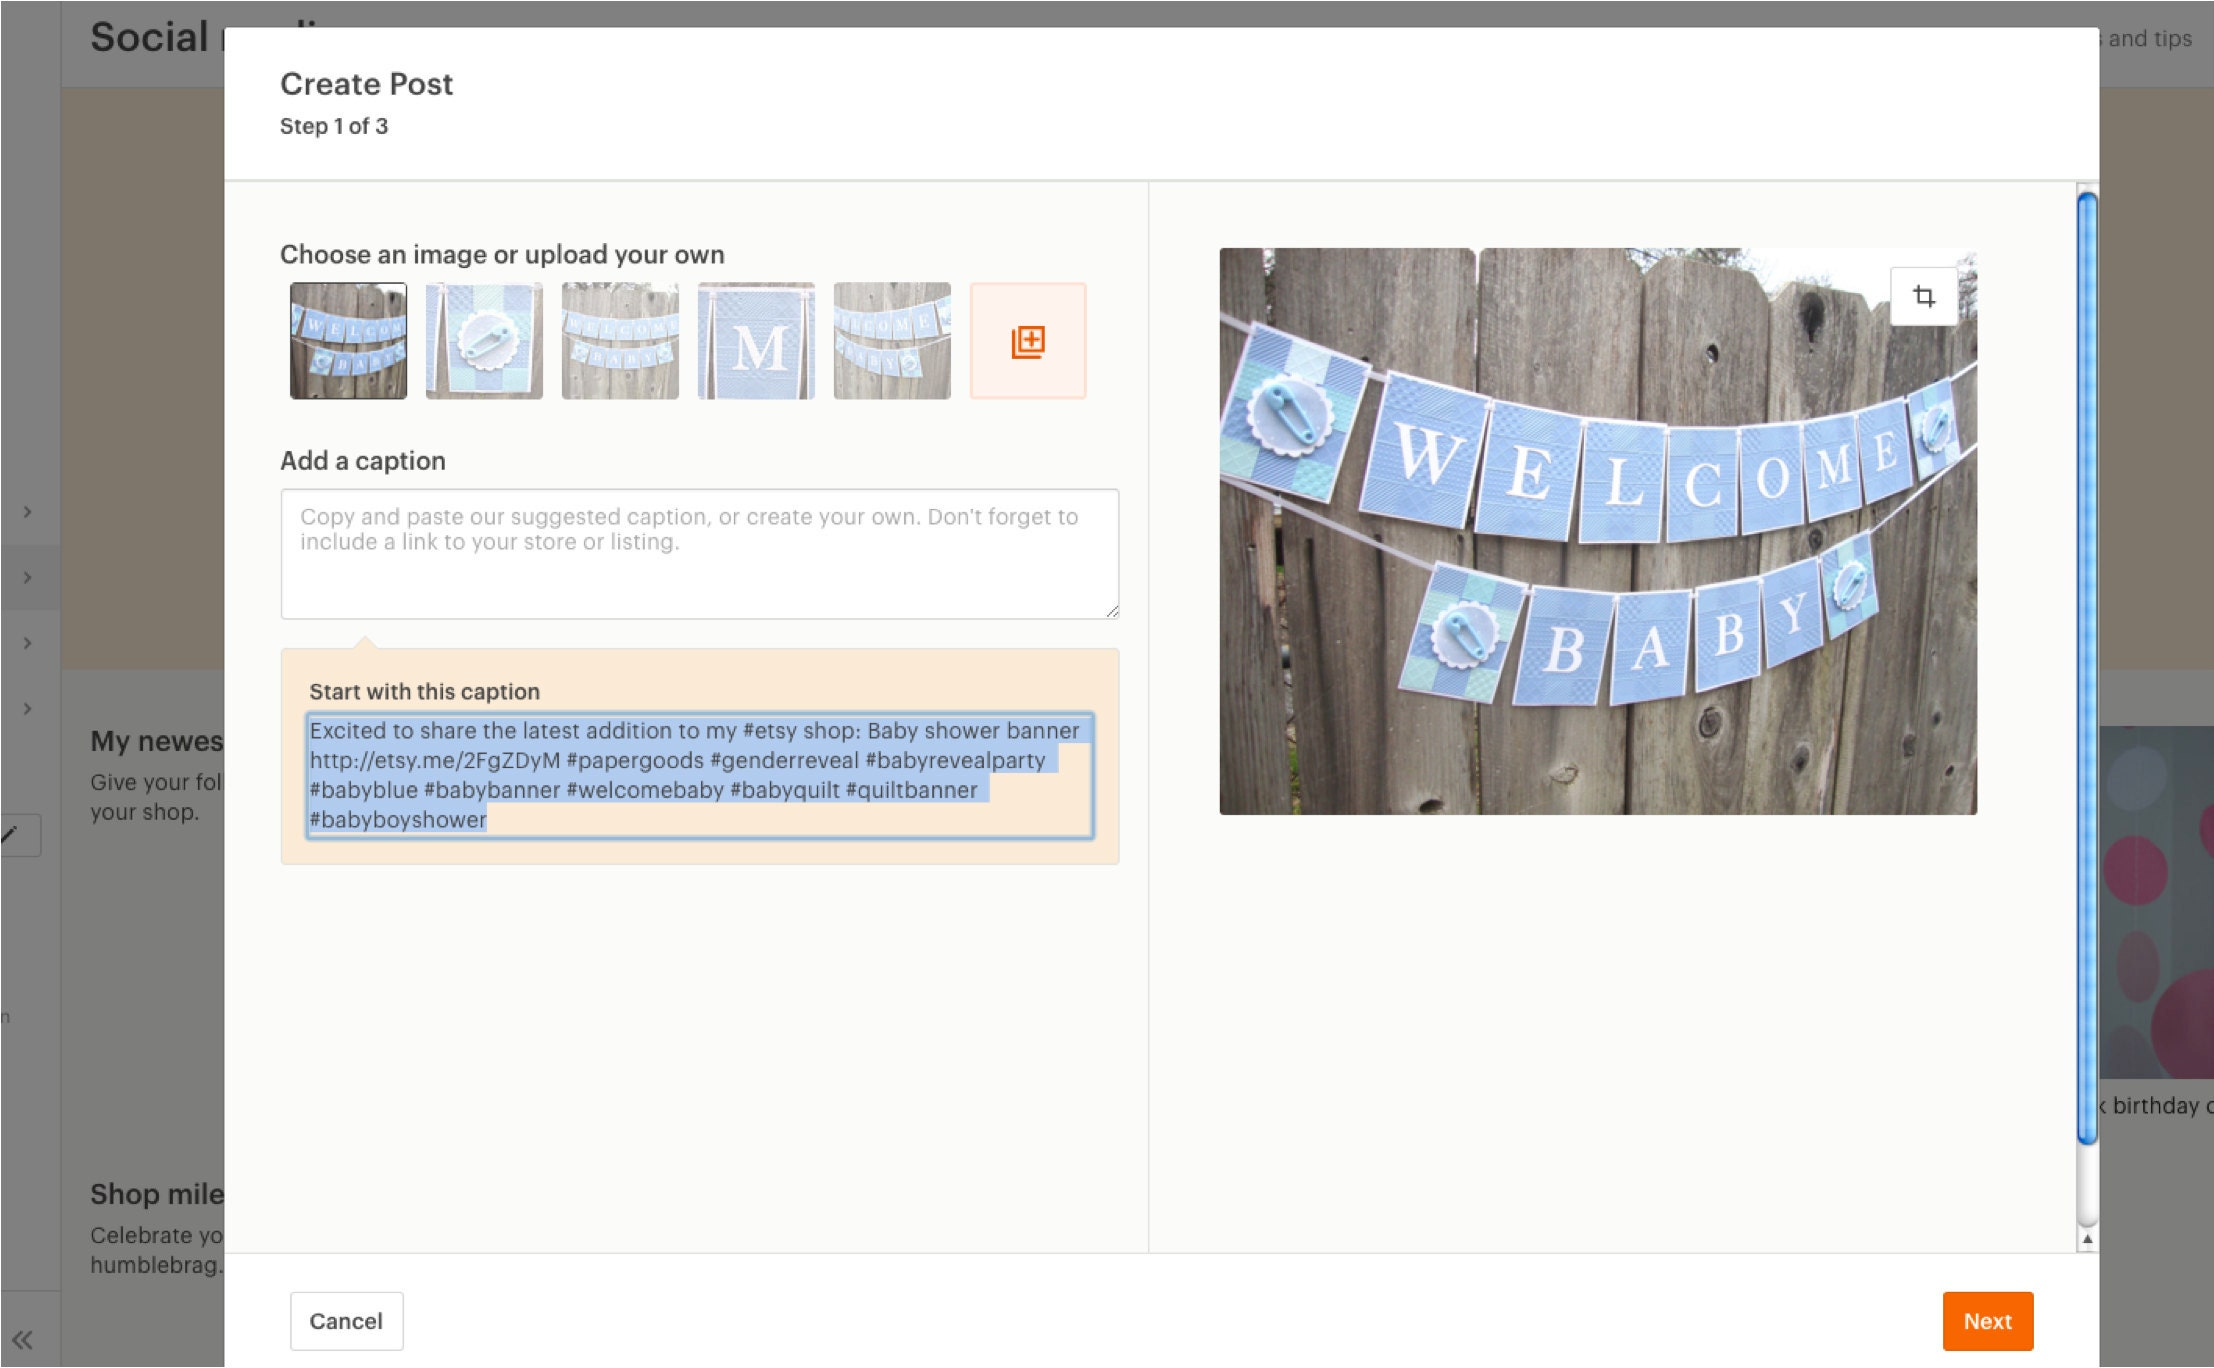 Social Media Create Post menu on Etsy